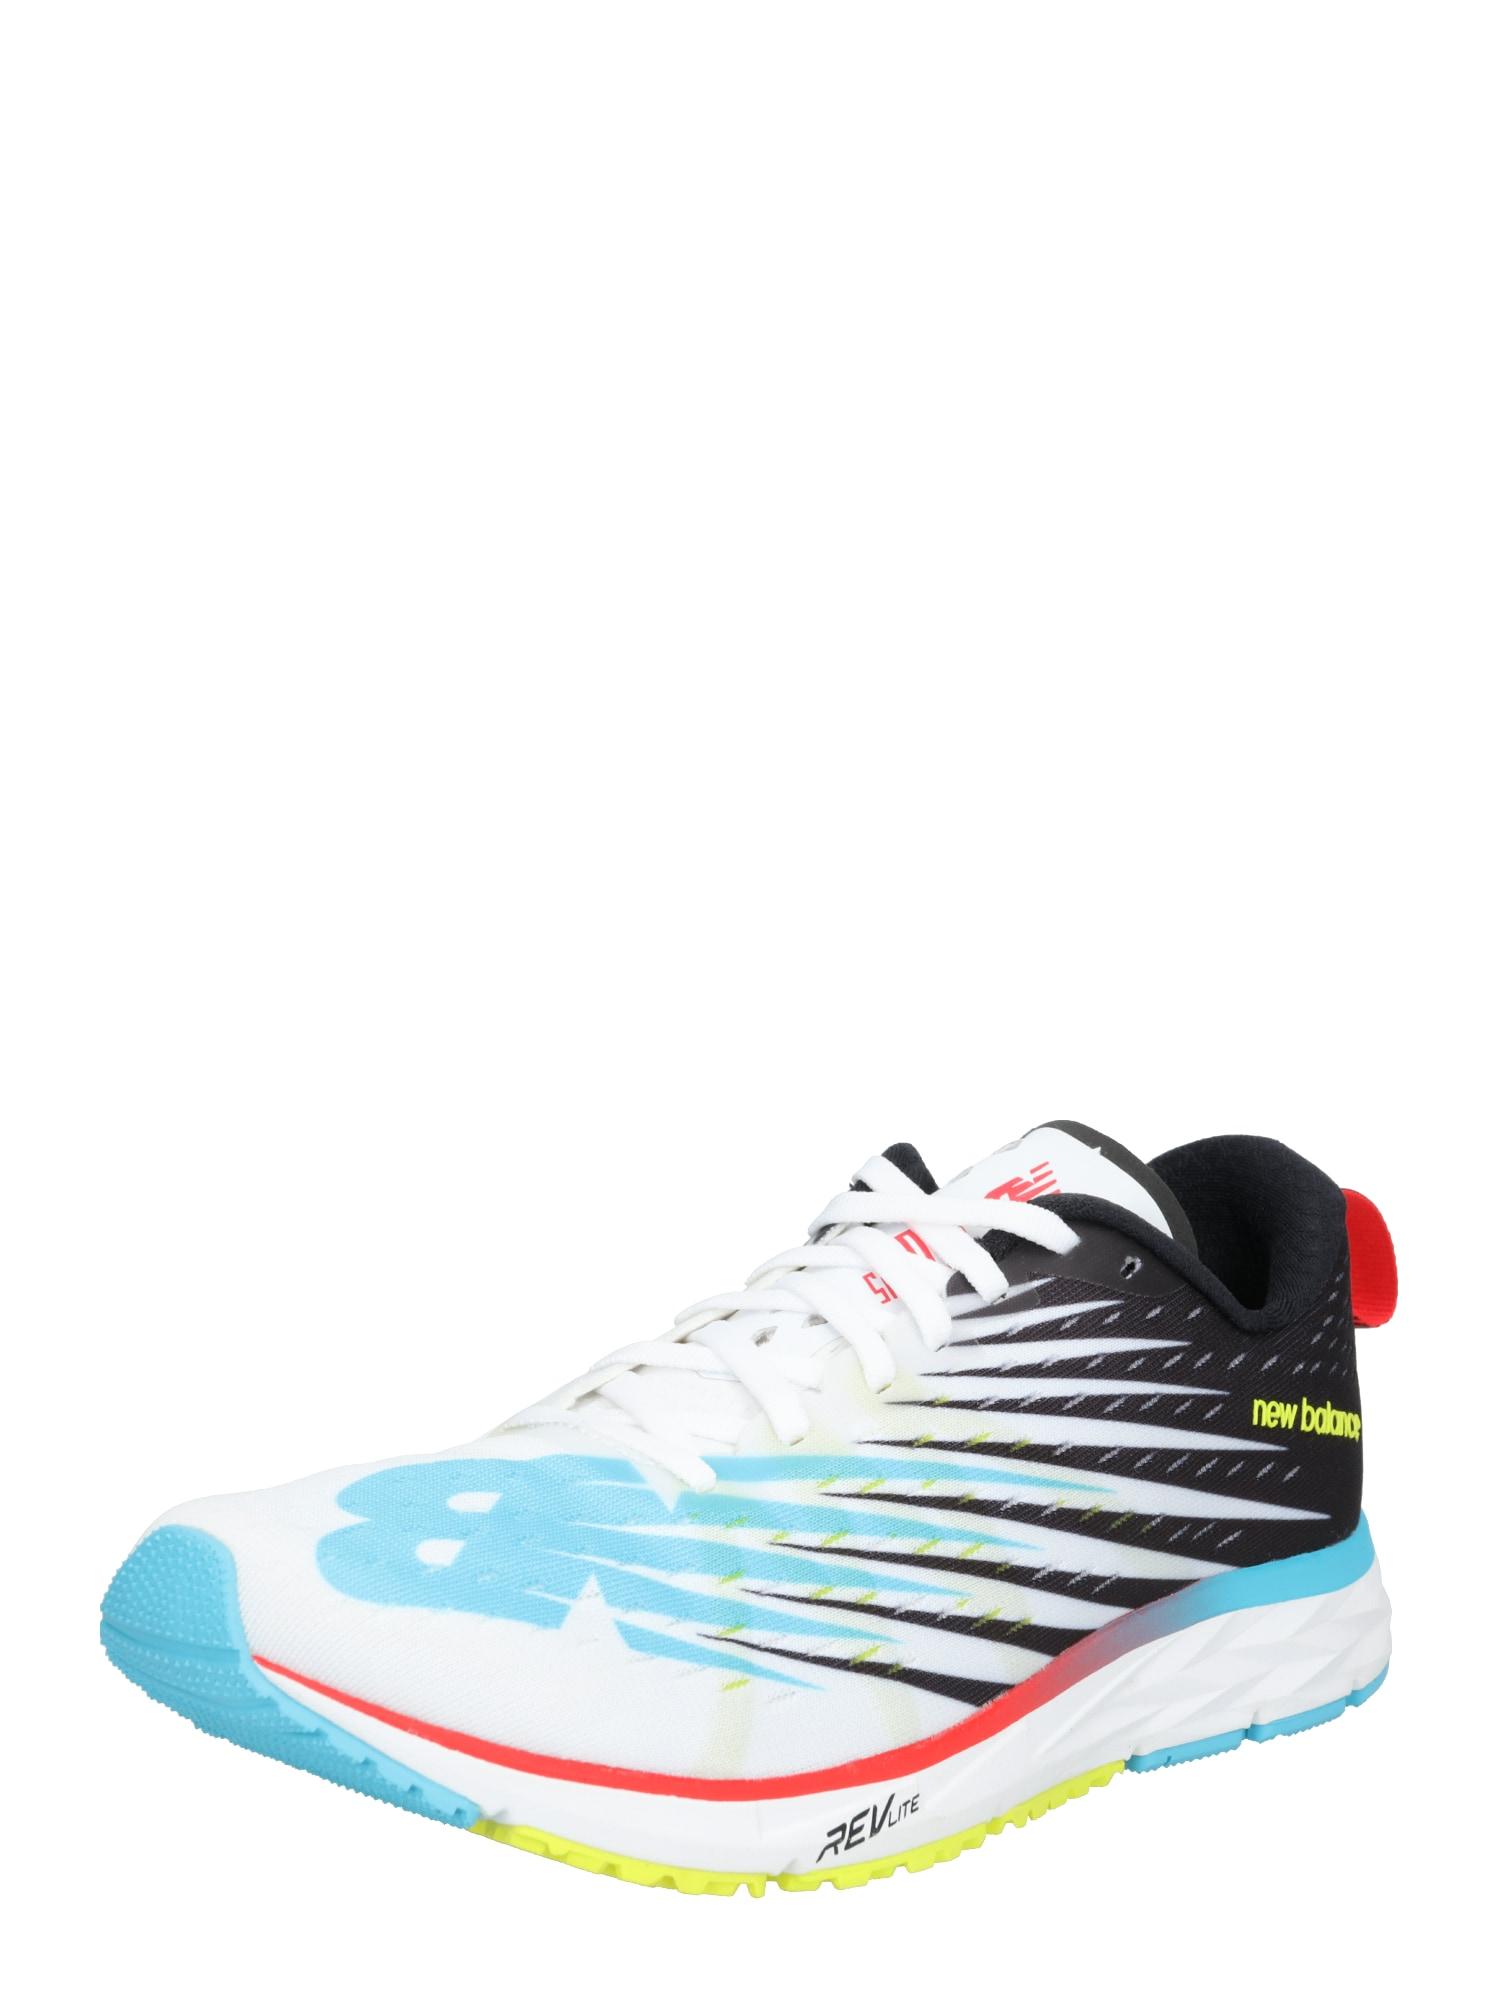 Běžecká obuv 1500 v5 modrá černá bílá New Balance